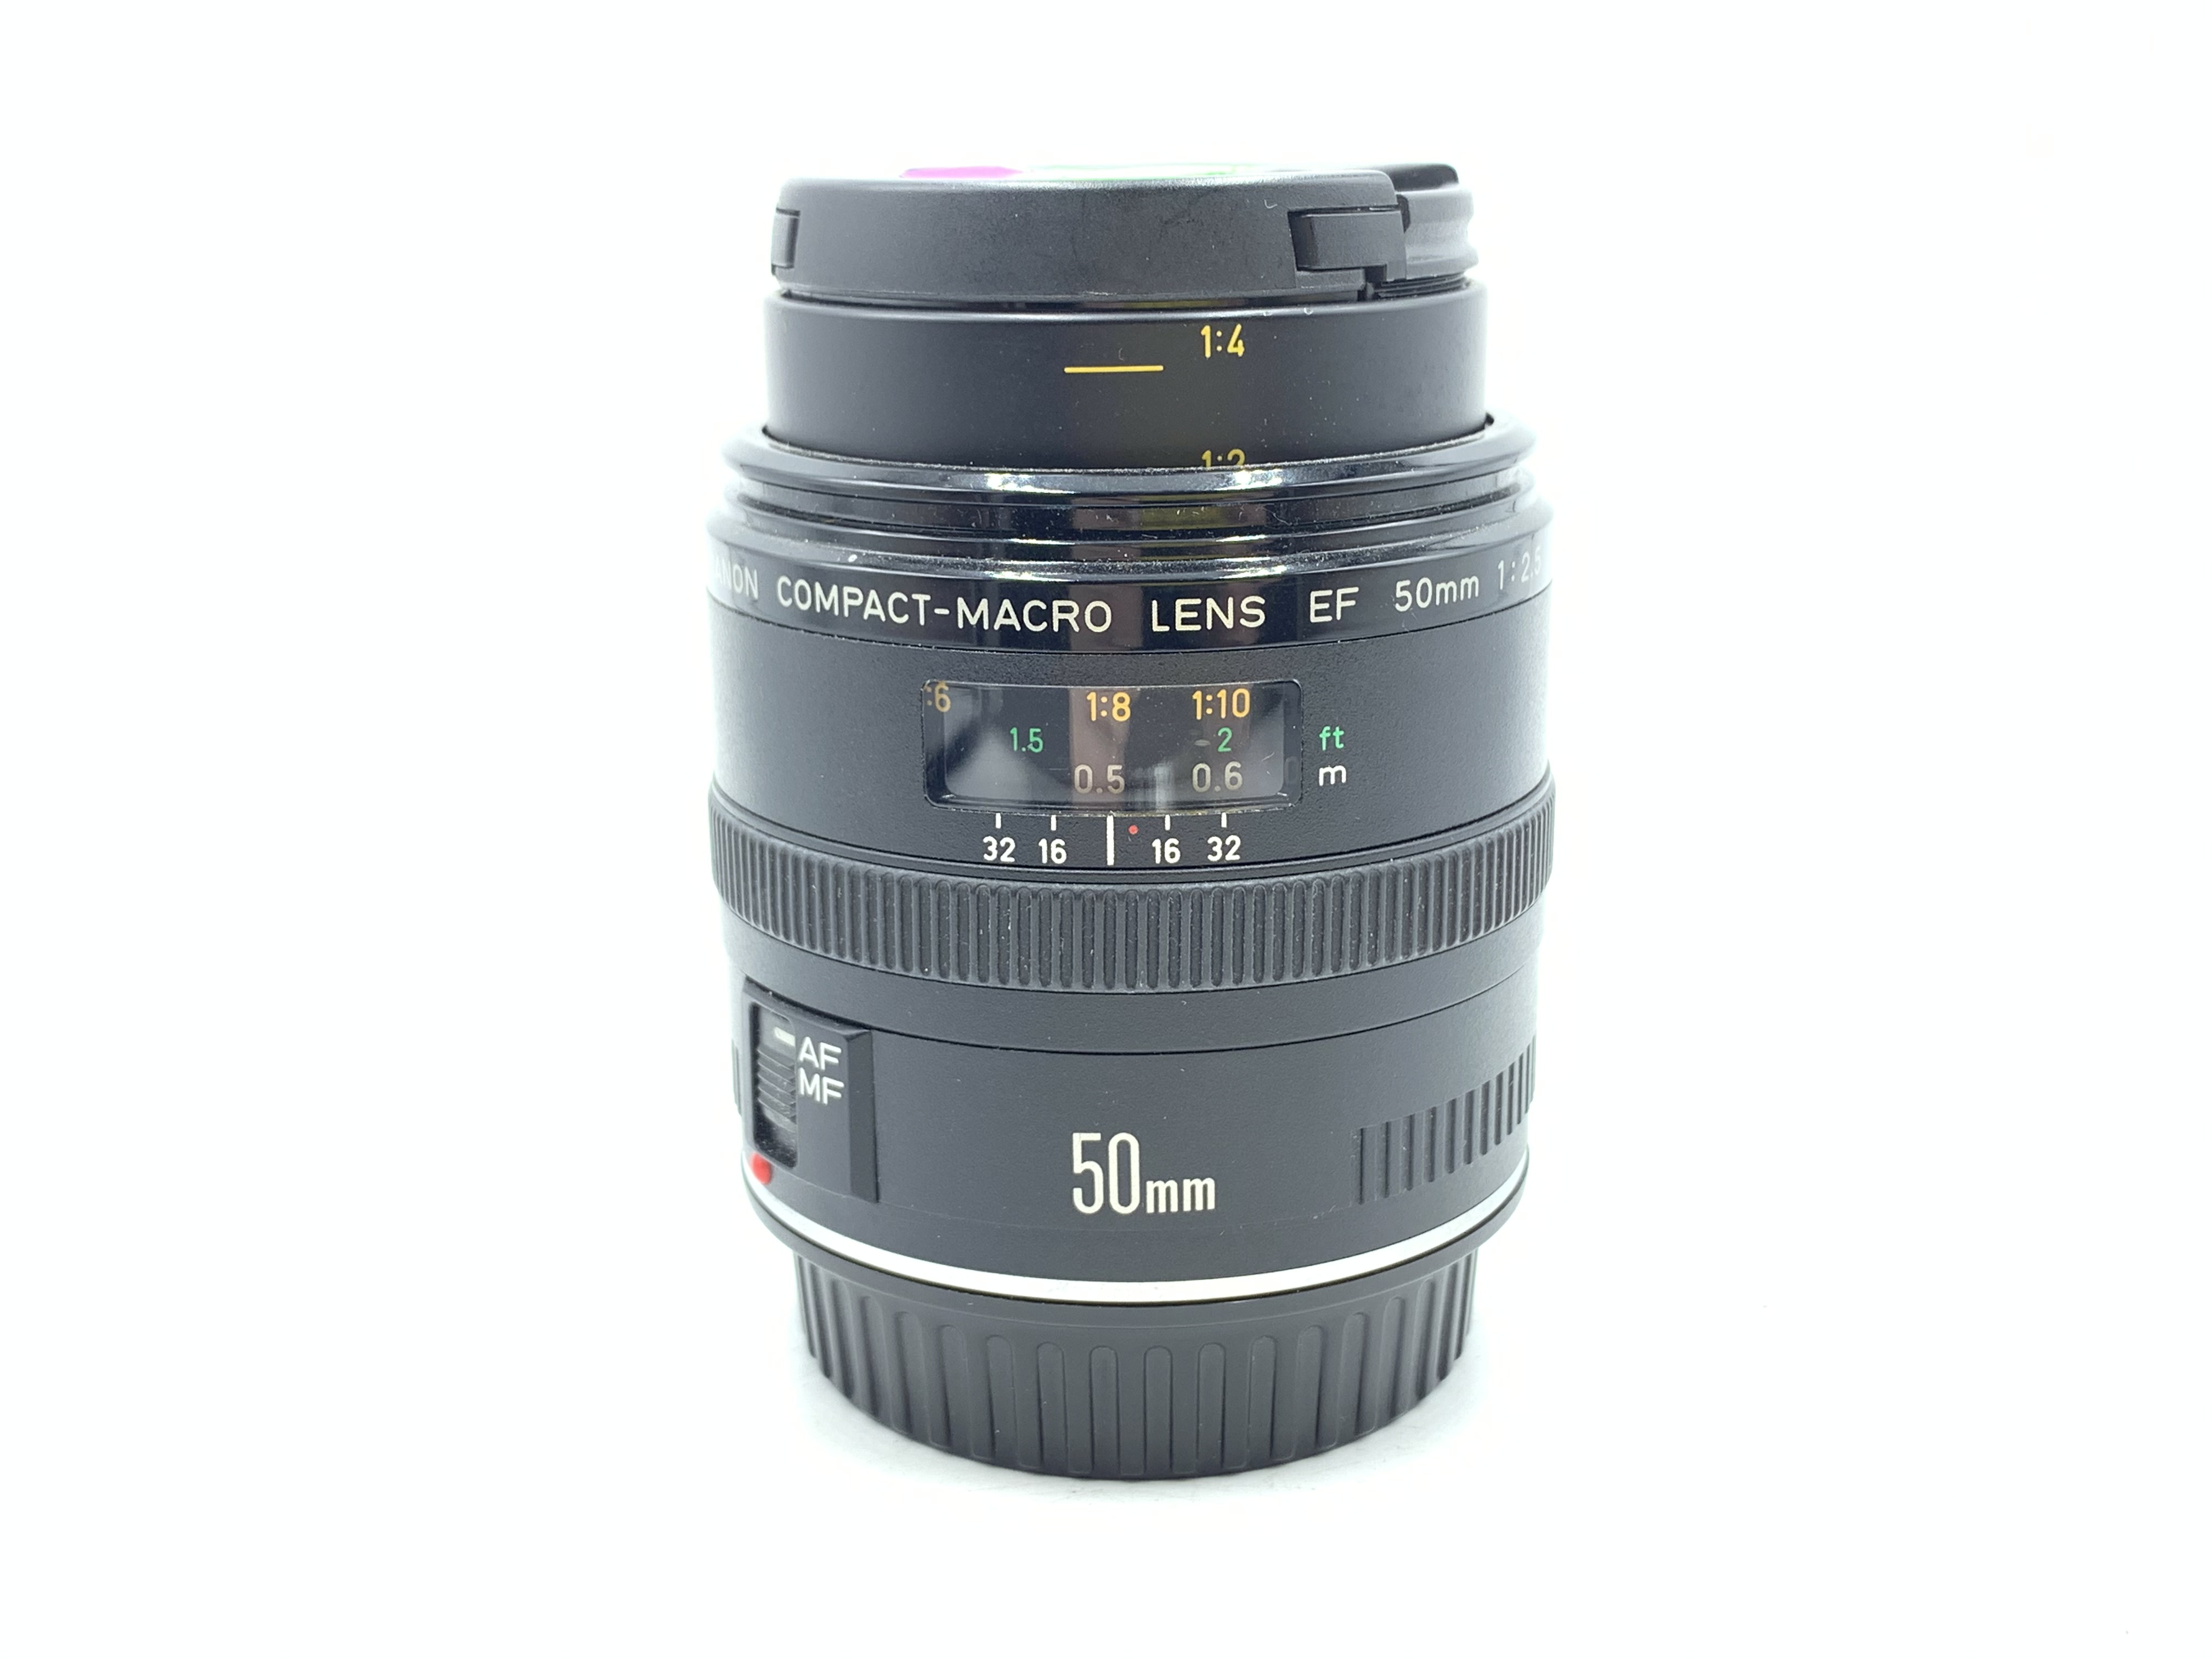 Used Canon 50mm F2.5 EF Macro Lens